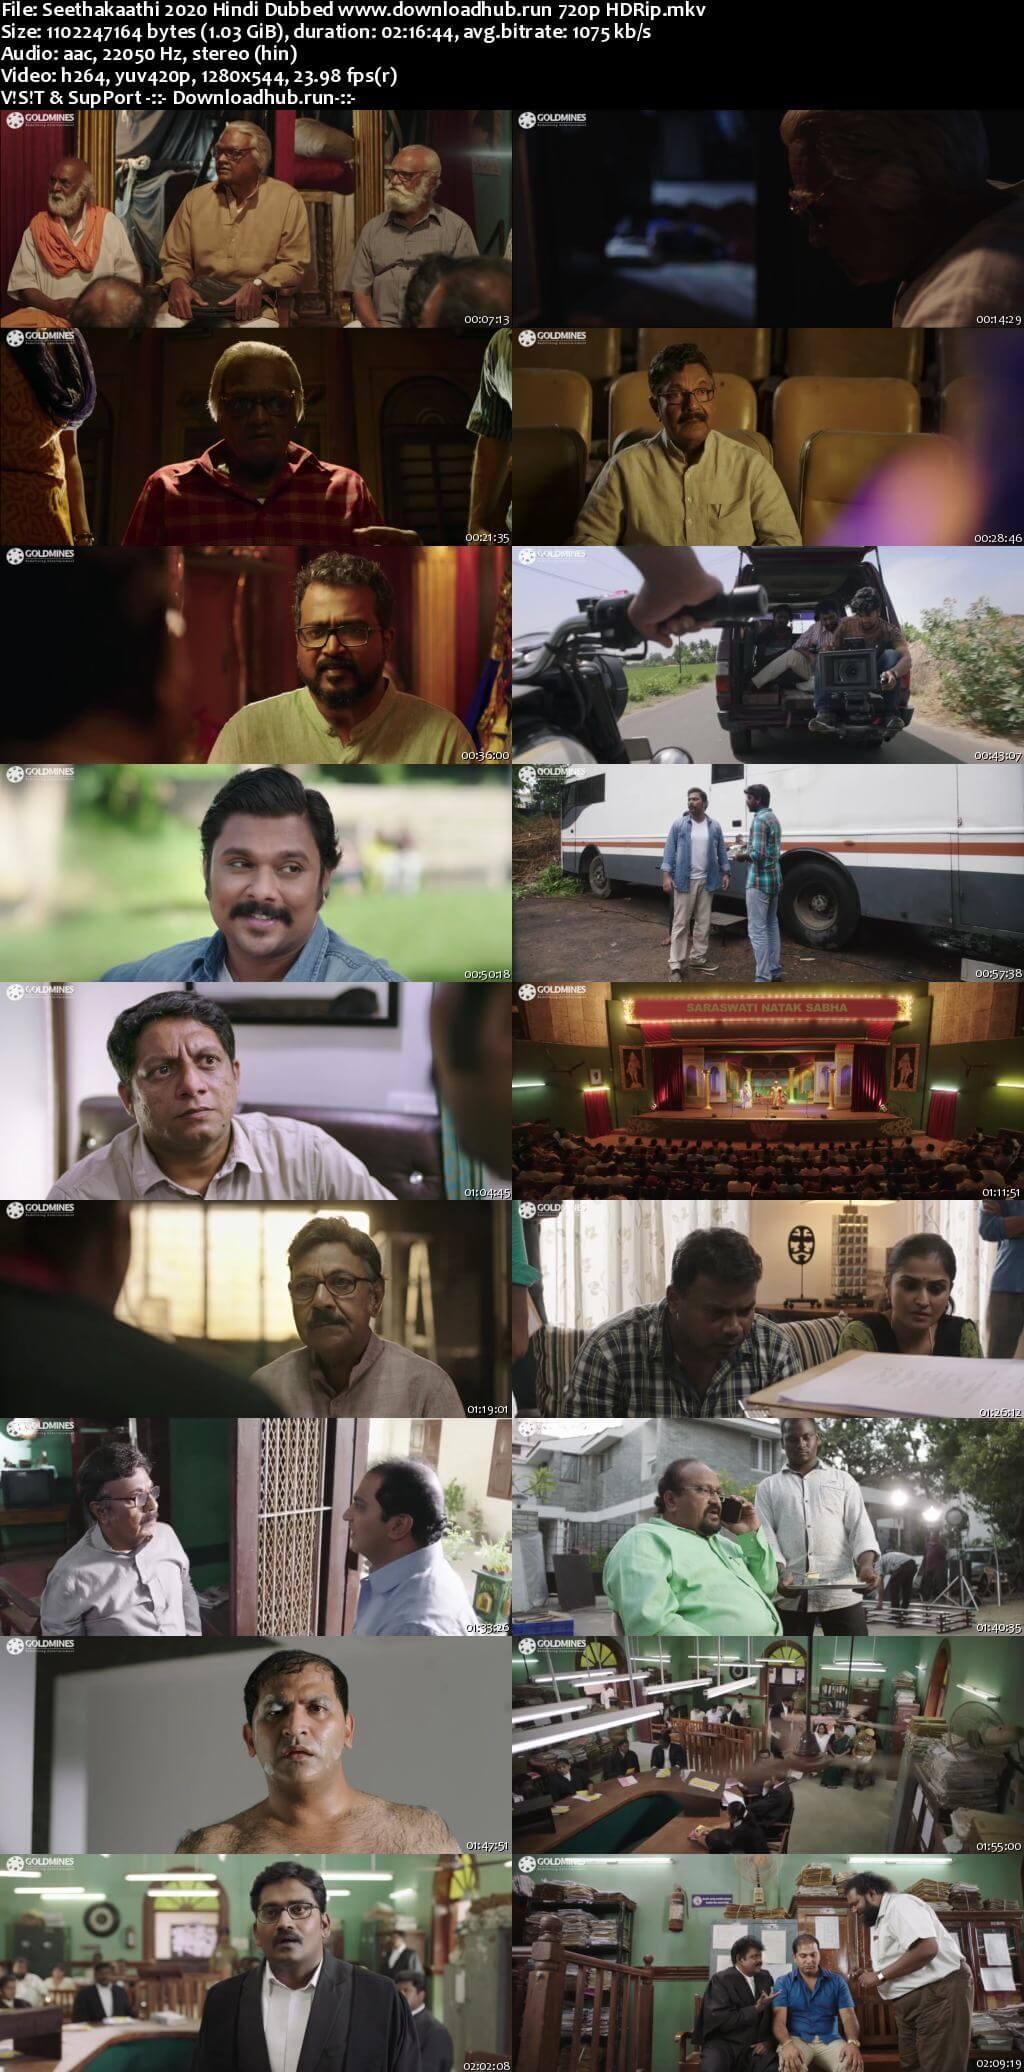 Seethakaathi 2020 Hindi Dubbed 720p HDRip x264